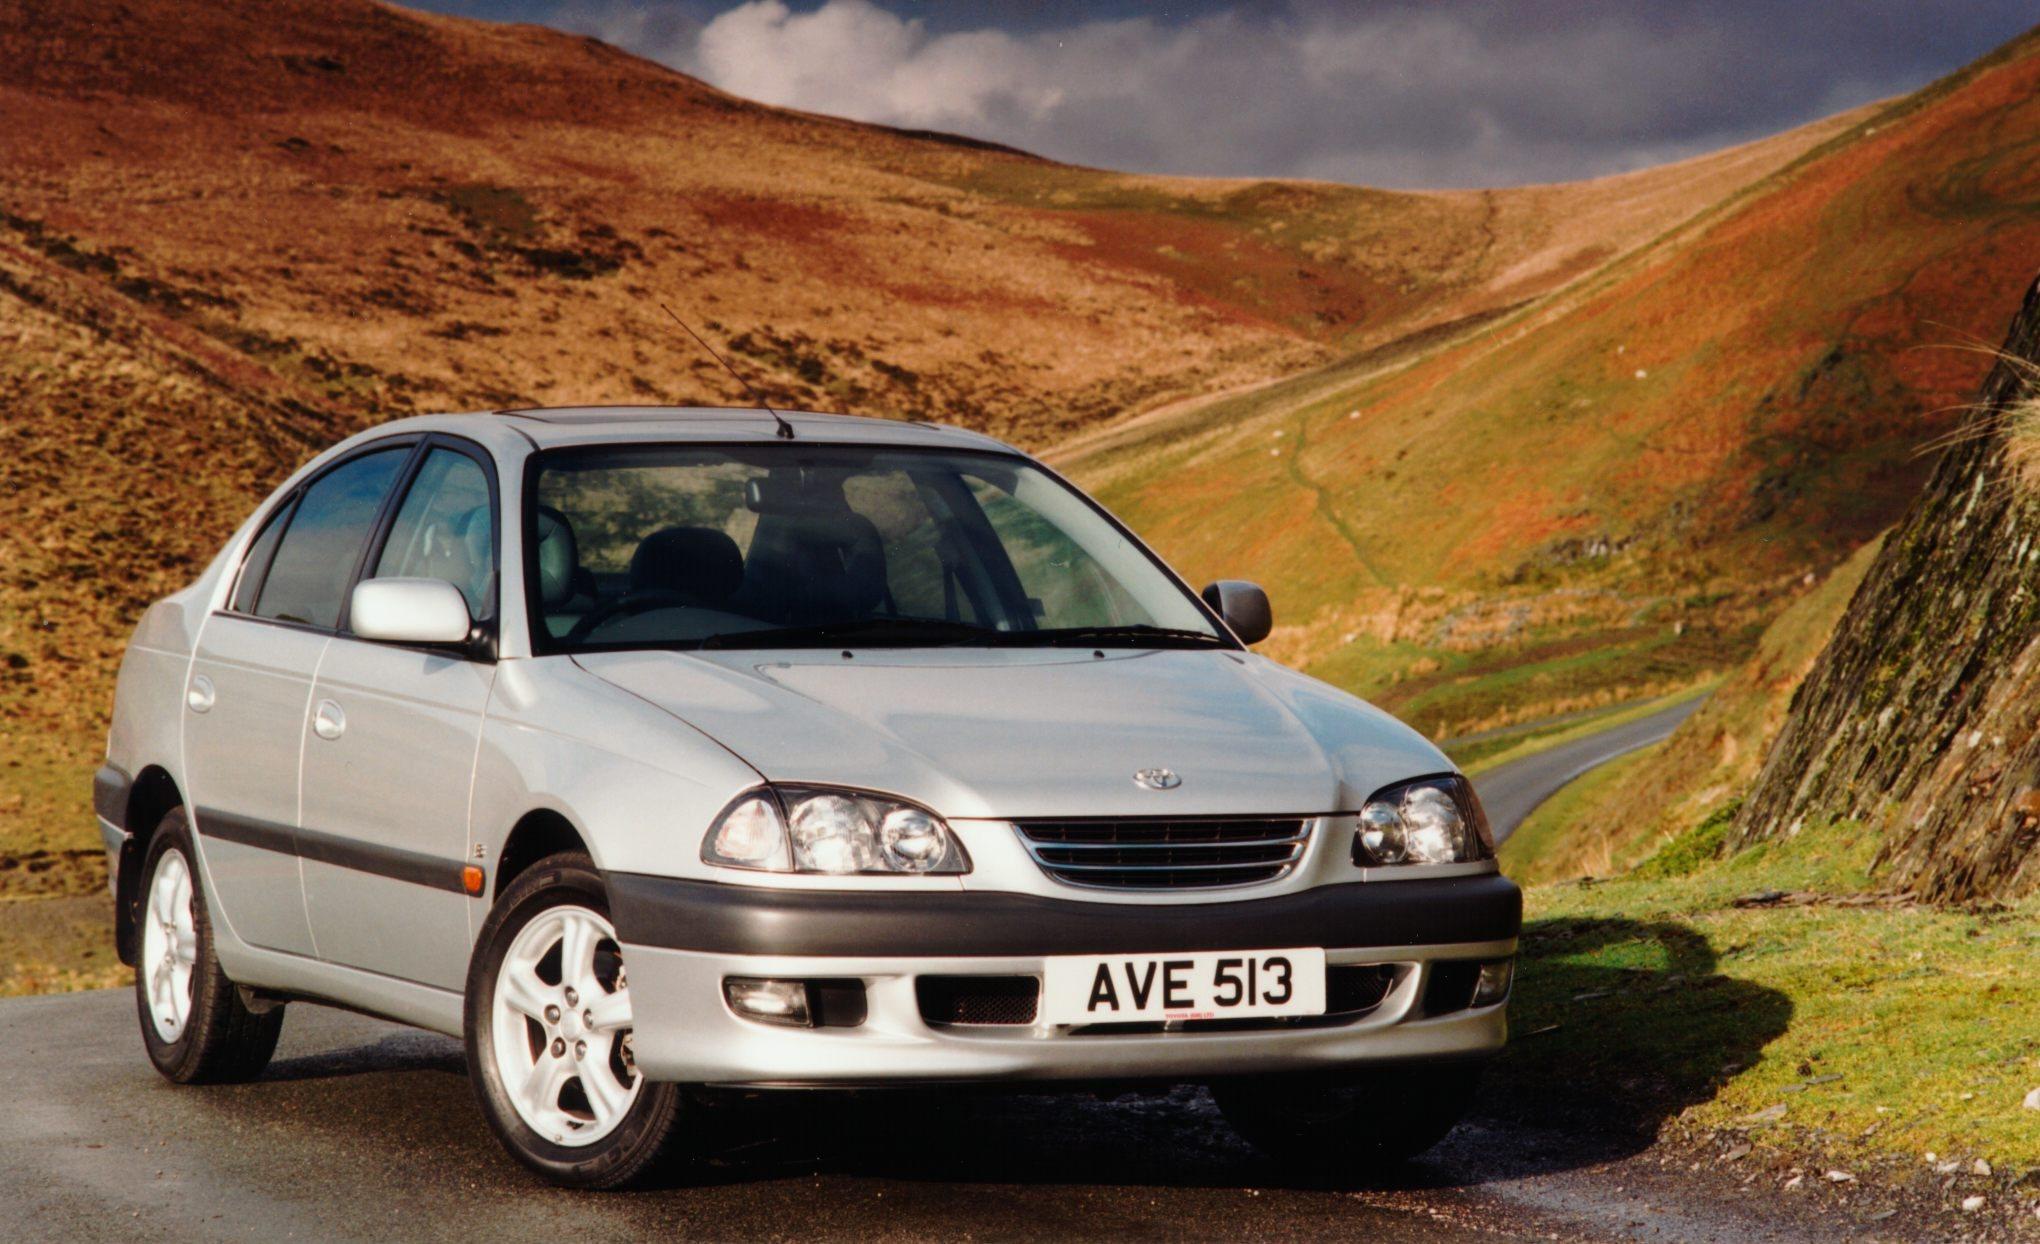 Toyota Avensis I 1997 - 2000 Hatchback 5 door #4